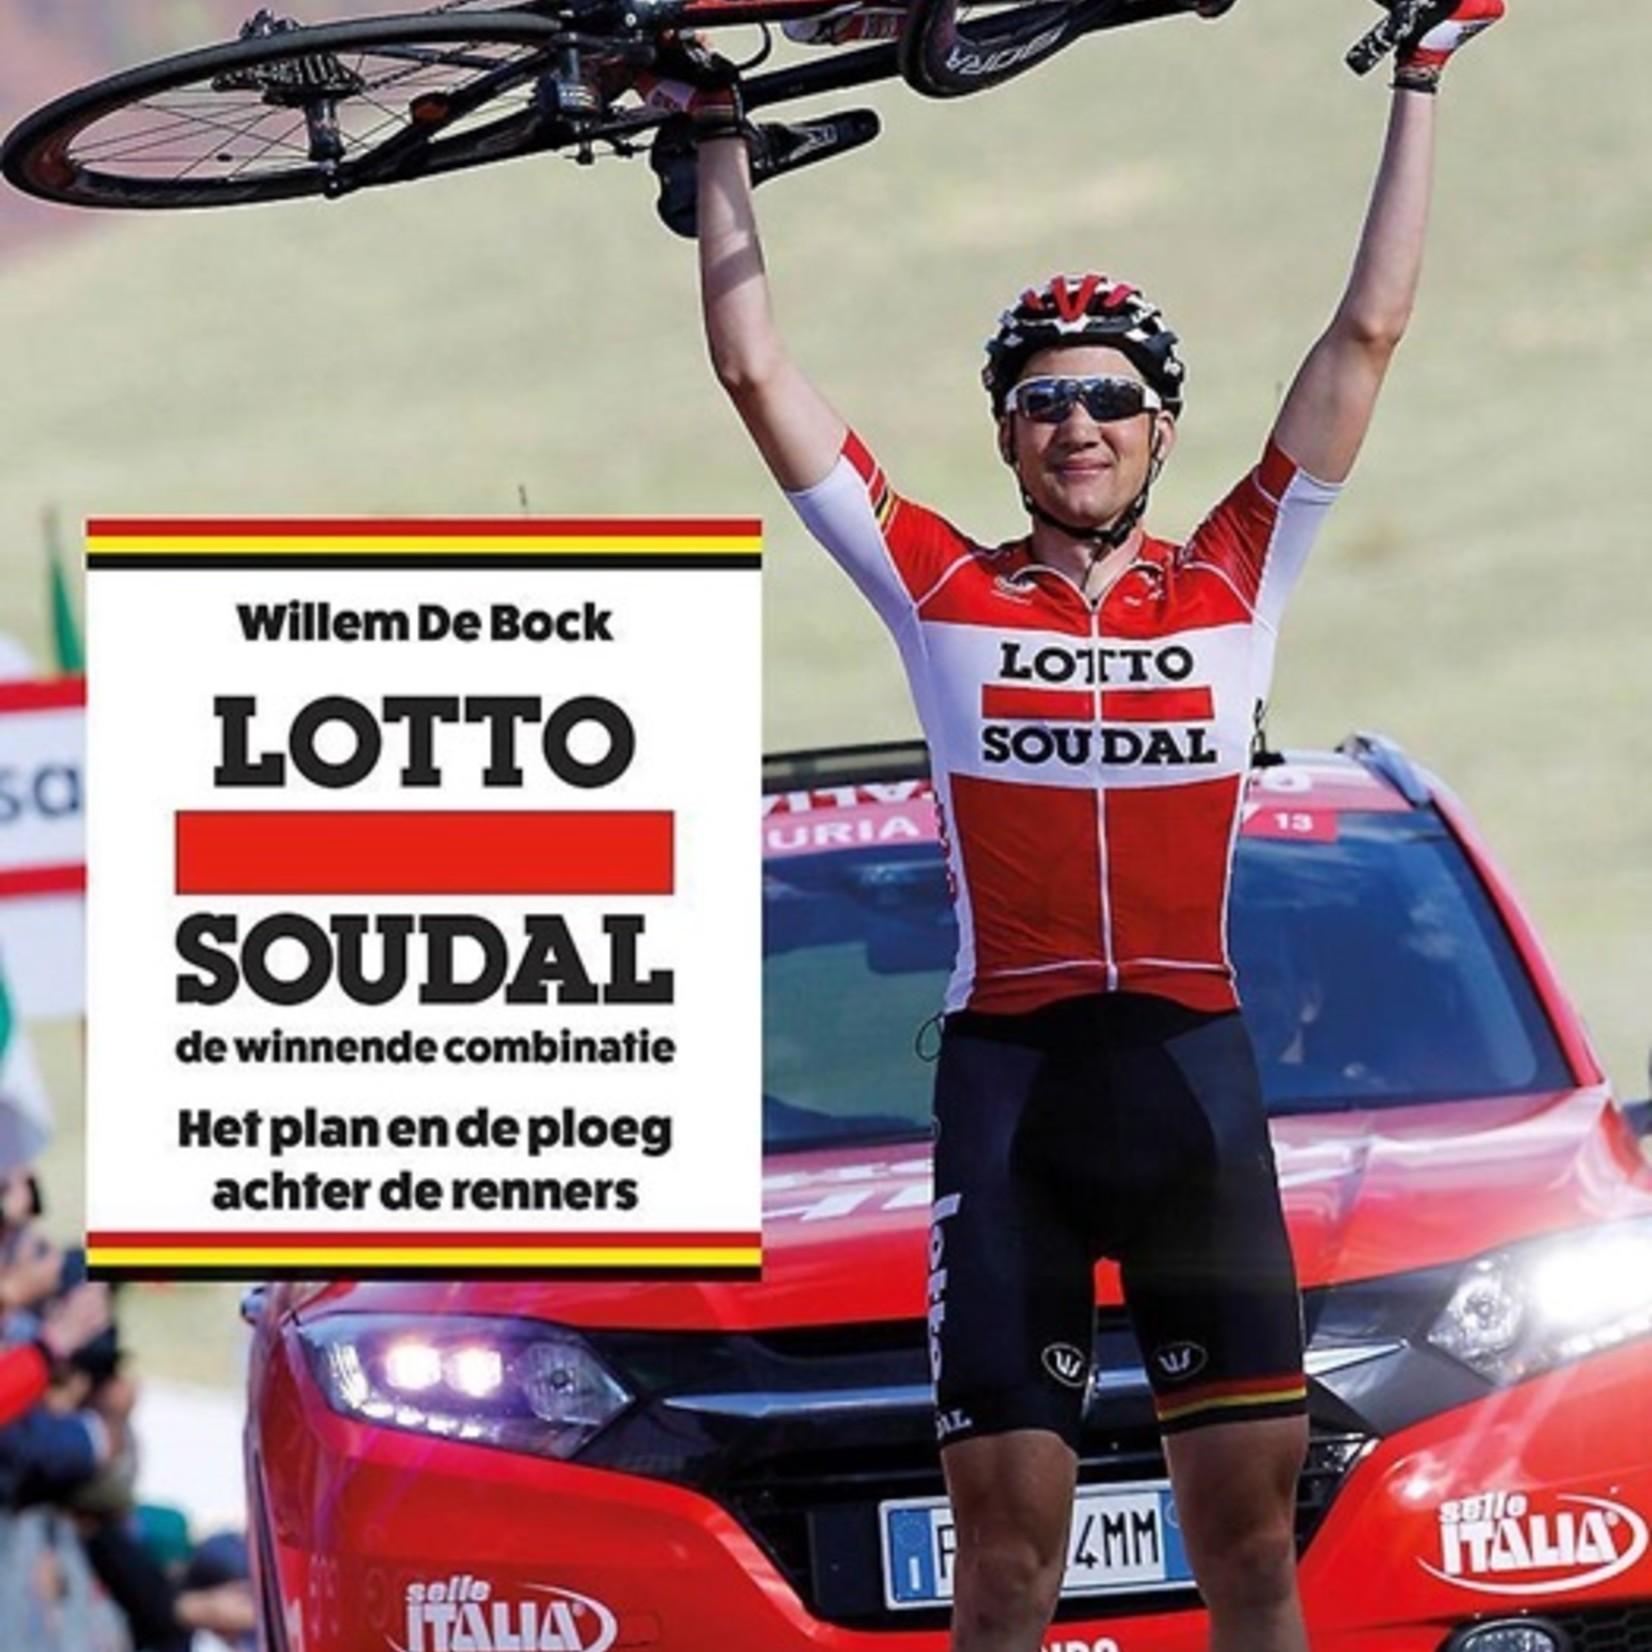 Book 'Lotto Soudal, de winnende combinatie' (NED)